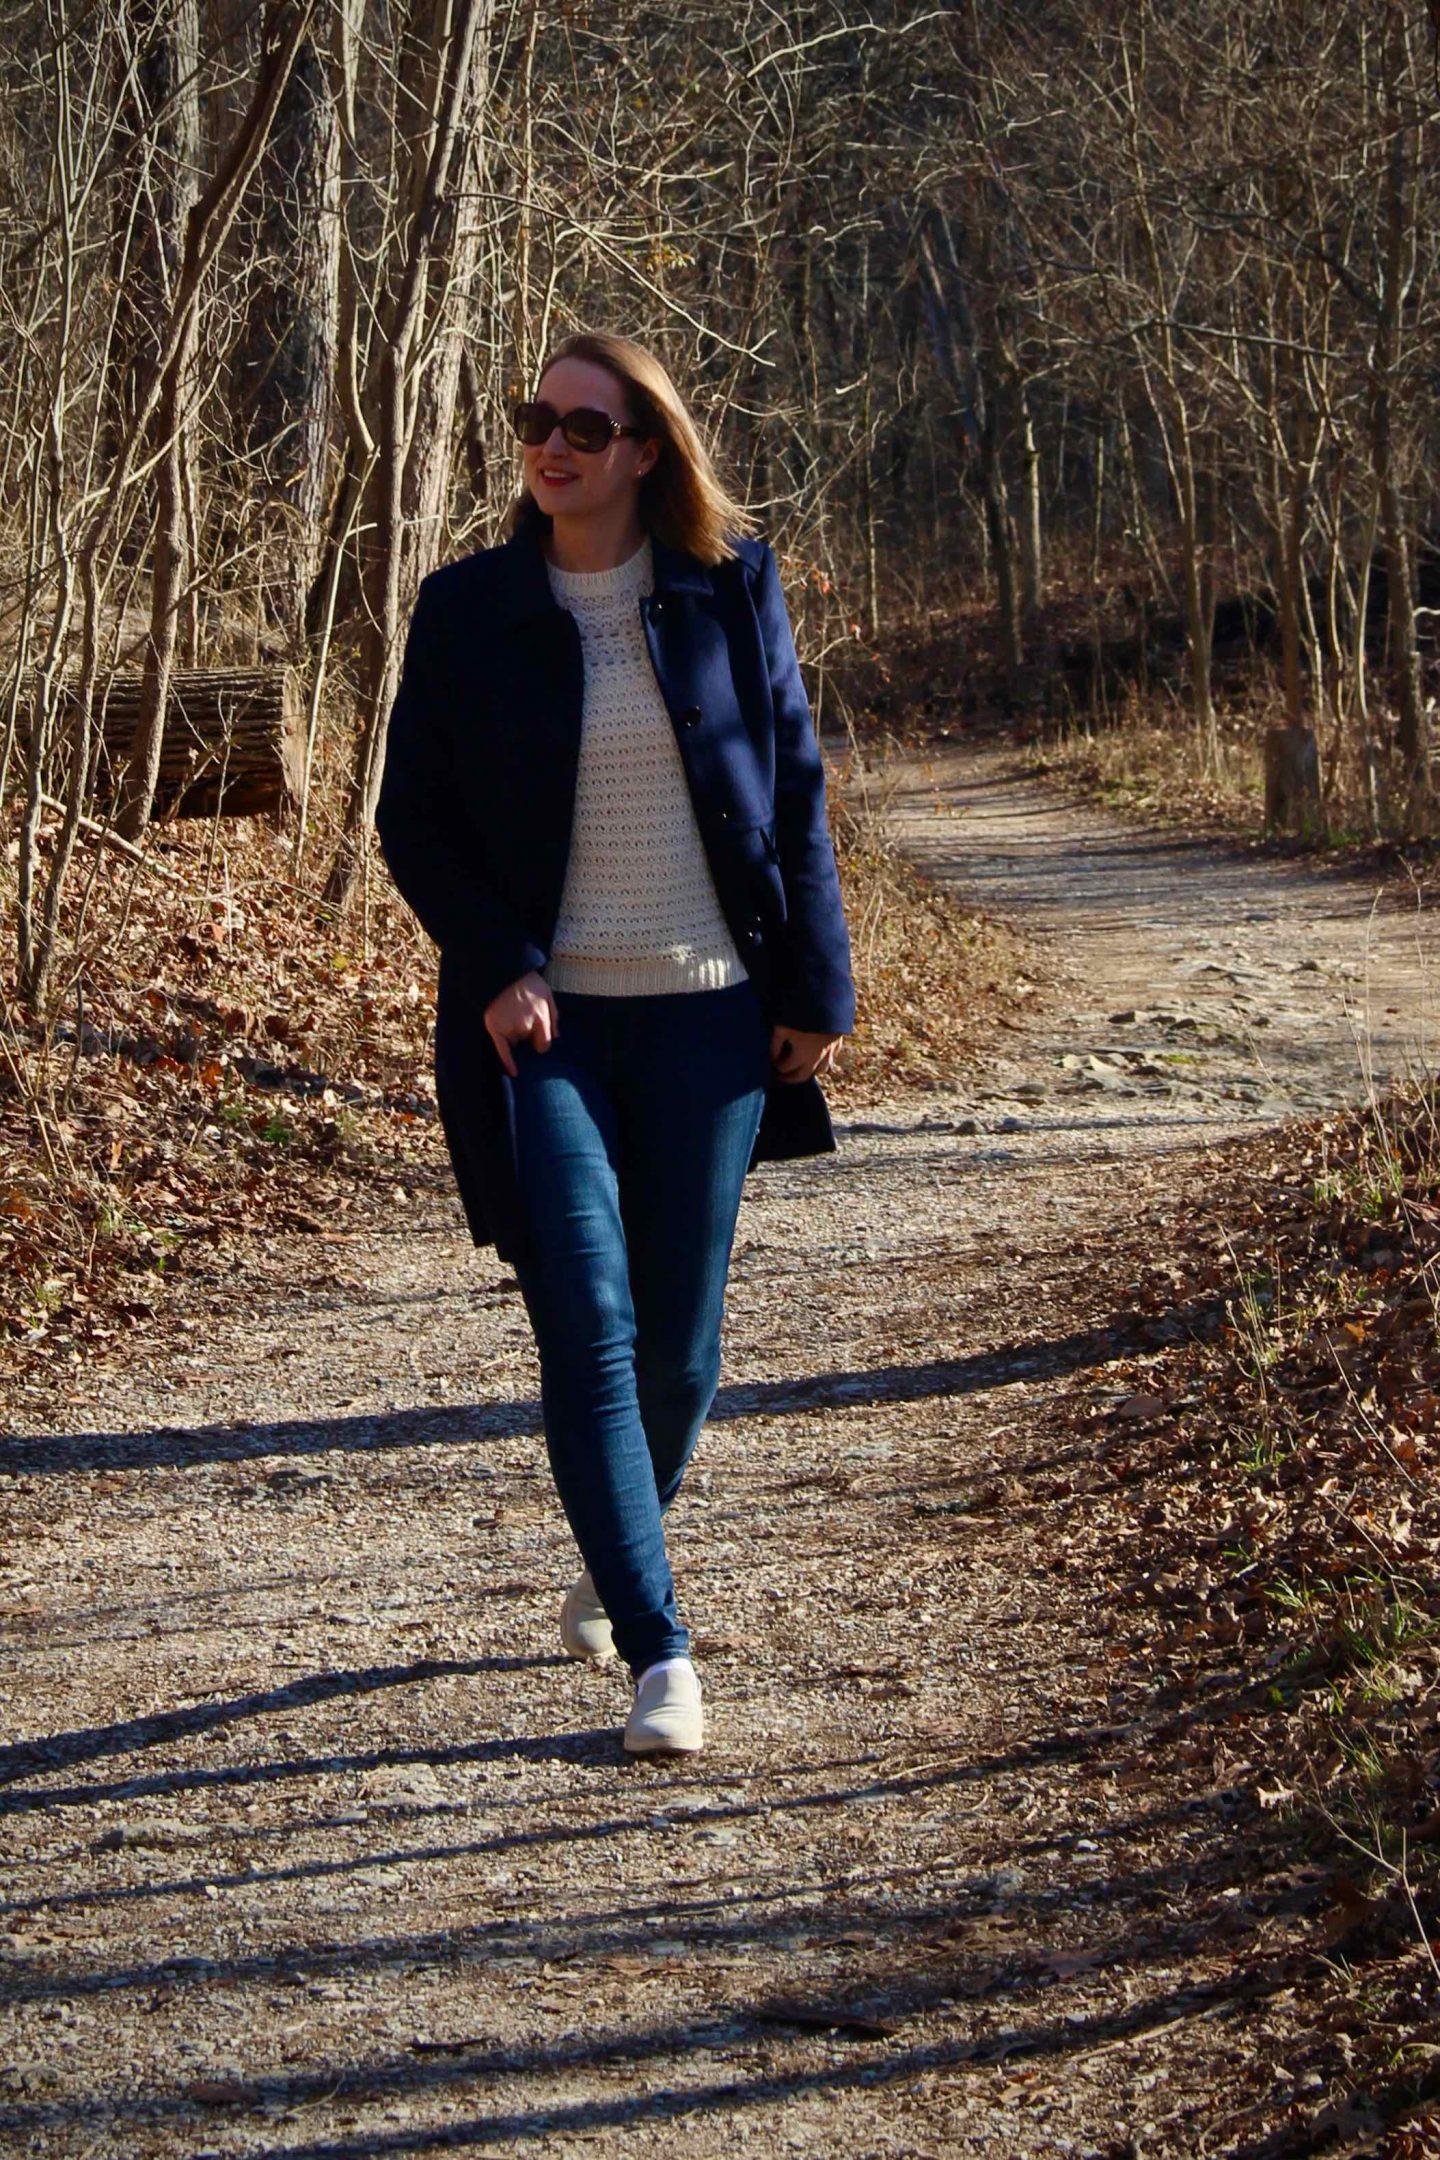 Preppy Winter Outfit | Walks through Sharon Woods Cincinnati | The Spectacular Adventurer